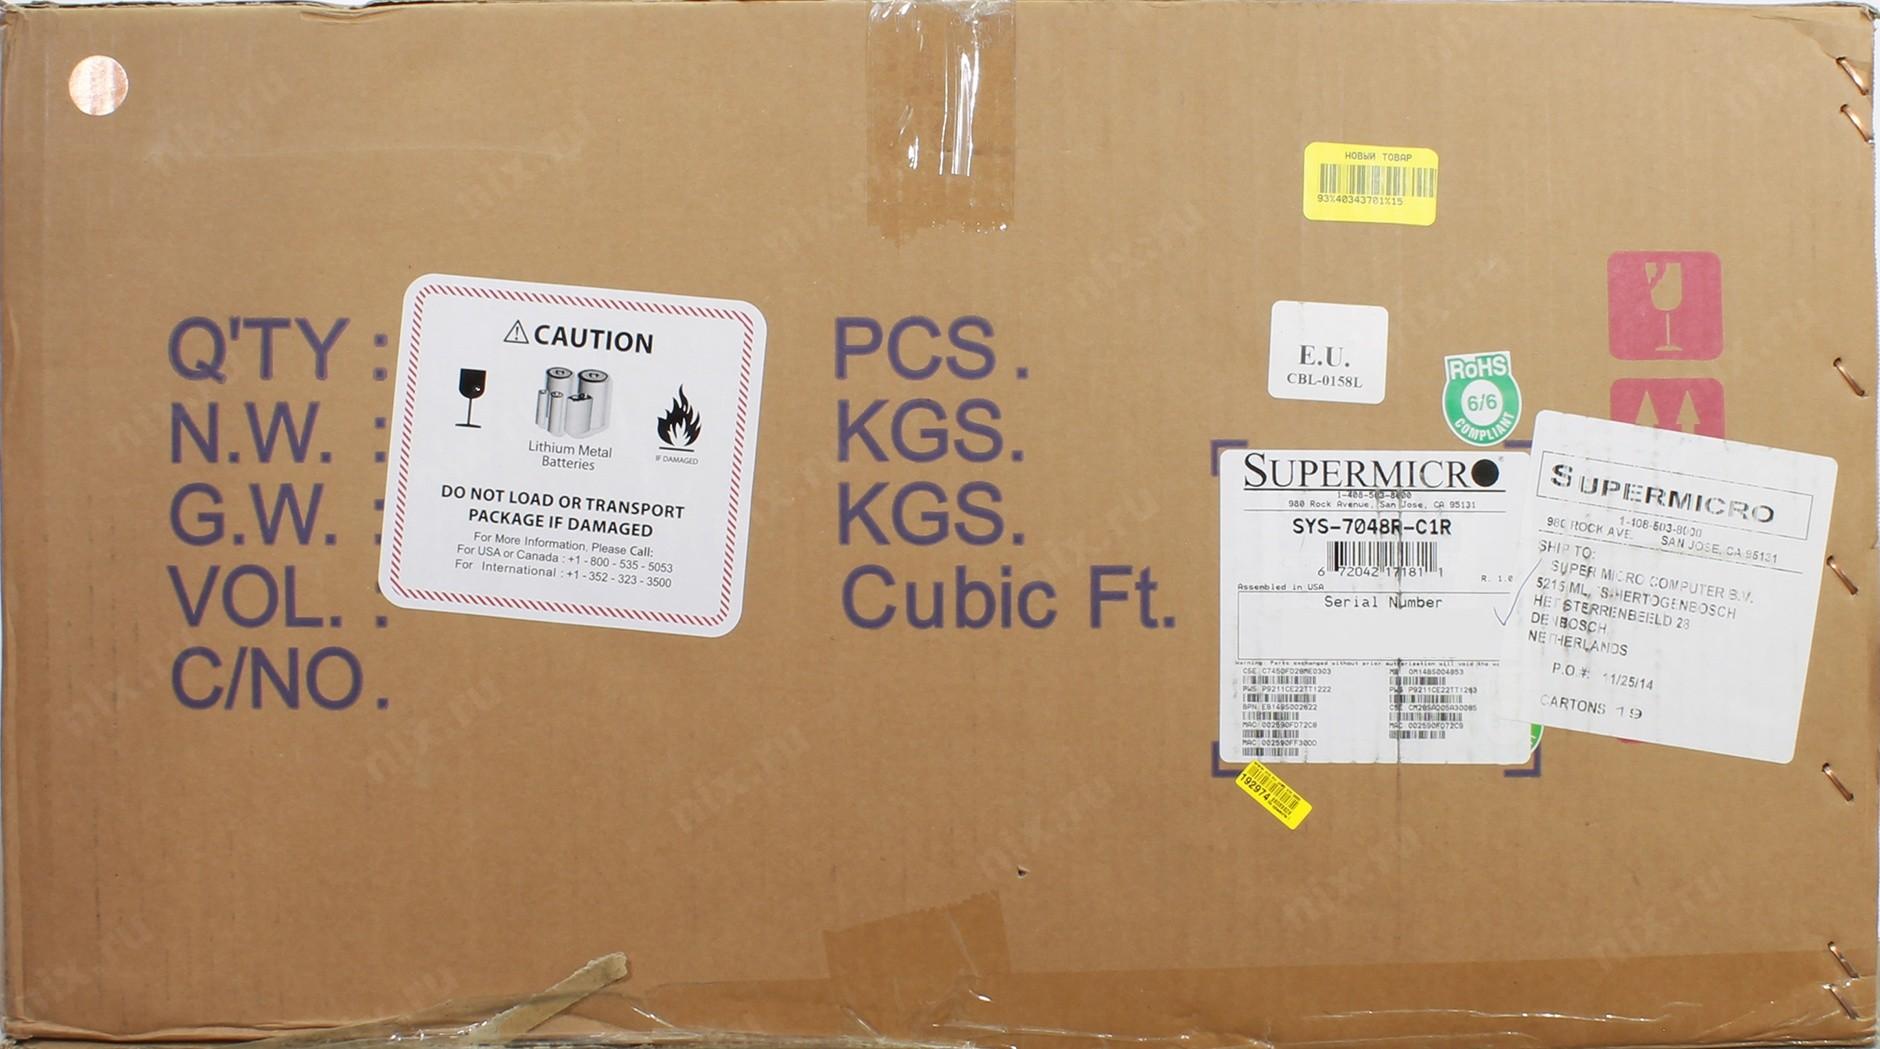 SuperServer 7048R-C1R